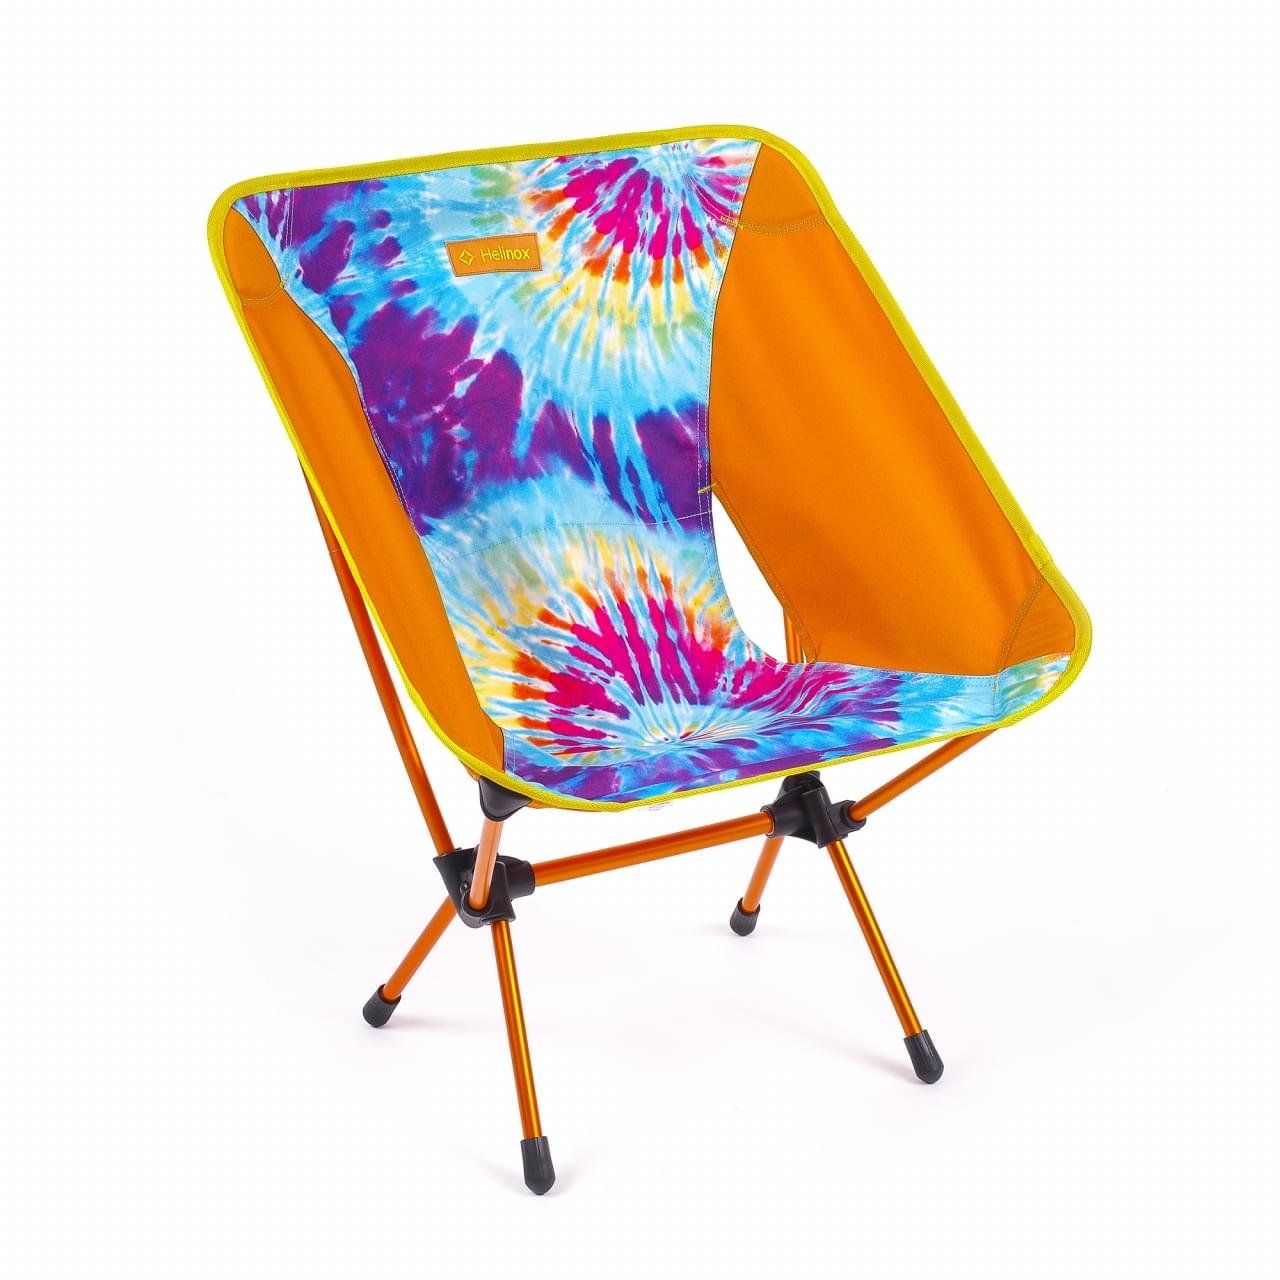 Helinox Chair One Lichtgewicht Stoel Oranje